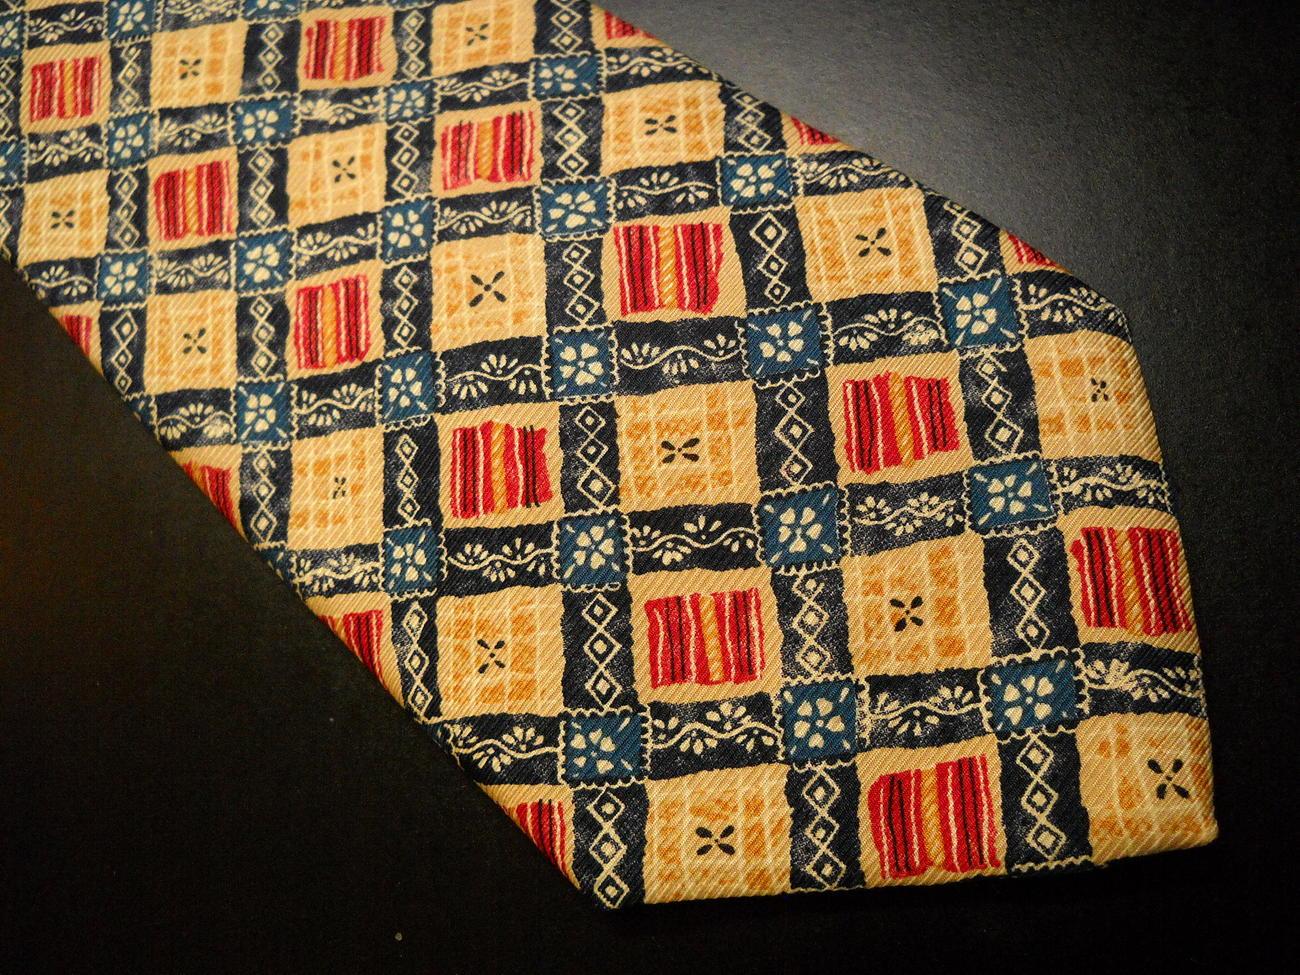 Il Gattopardo Neck Tie Boxes in Golds Yellows Reds Blues White Italian Made Silk